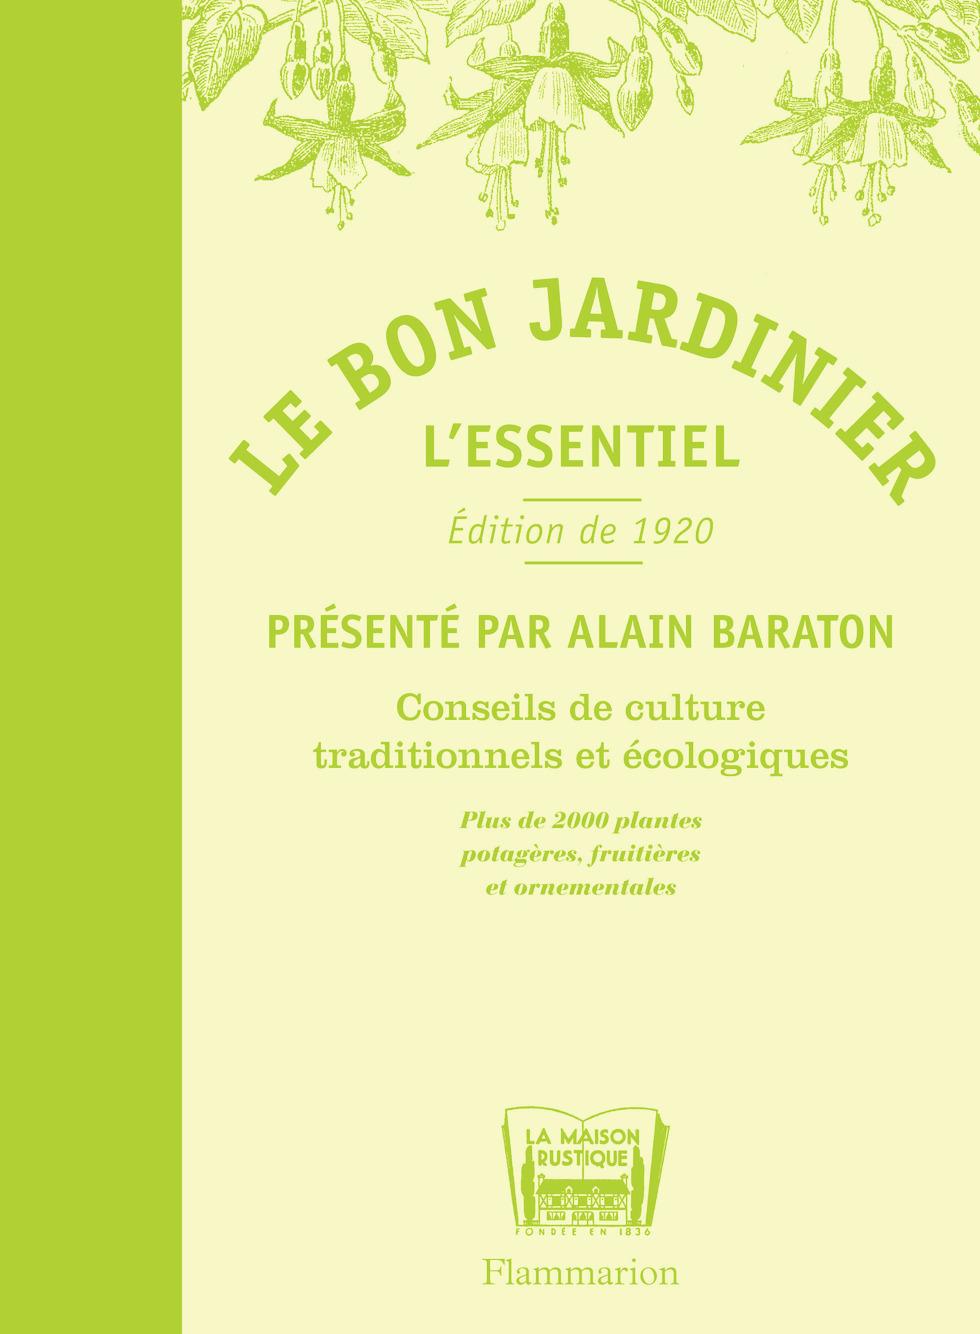 LE BON JARDINIER - L'ESSENTIEL